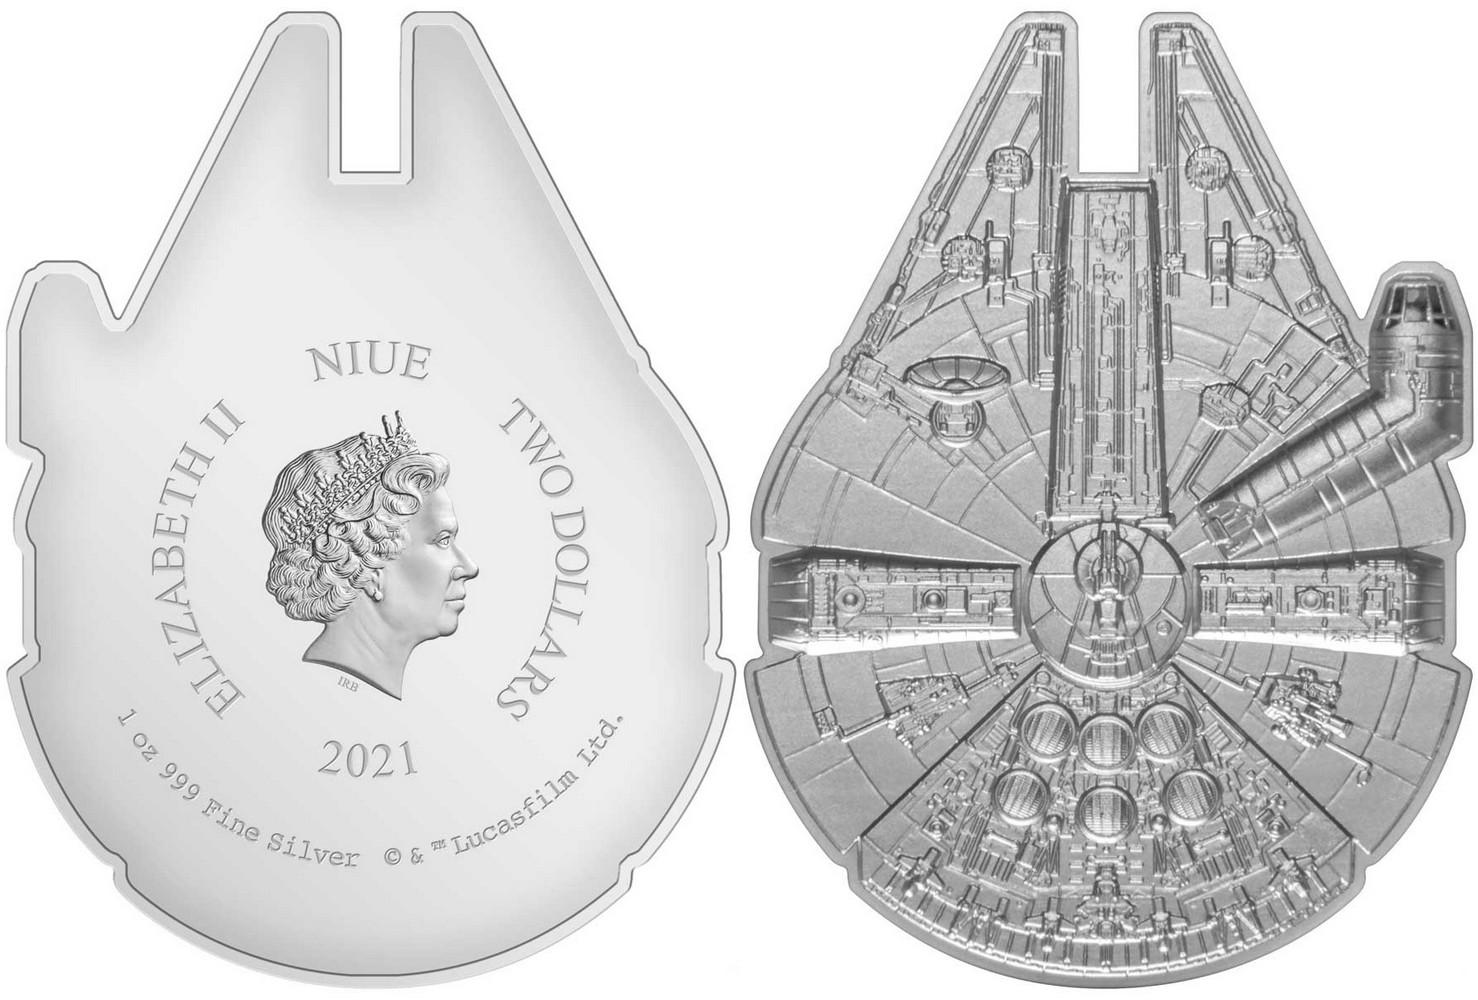 niue-2021-star-wars-faucon-millennium